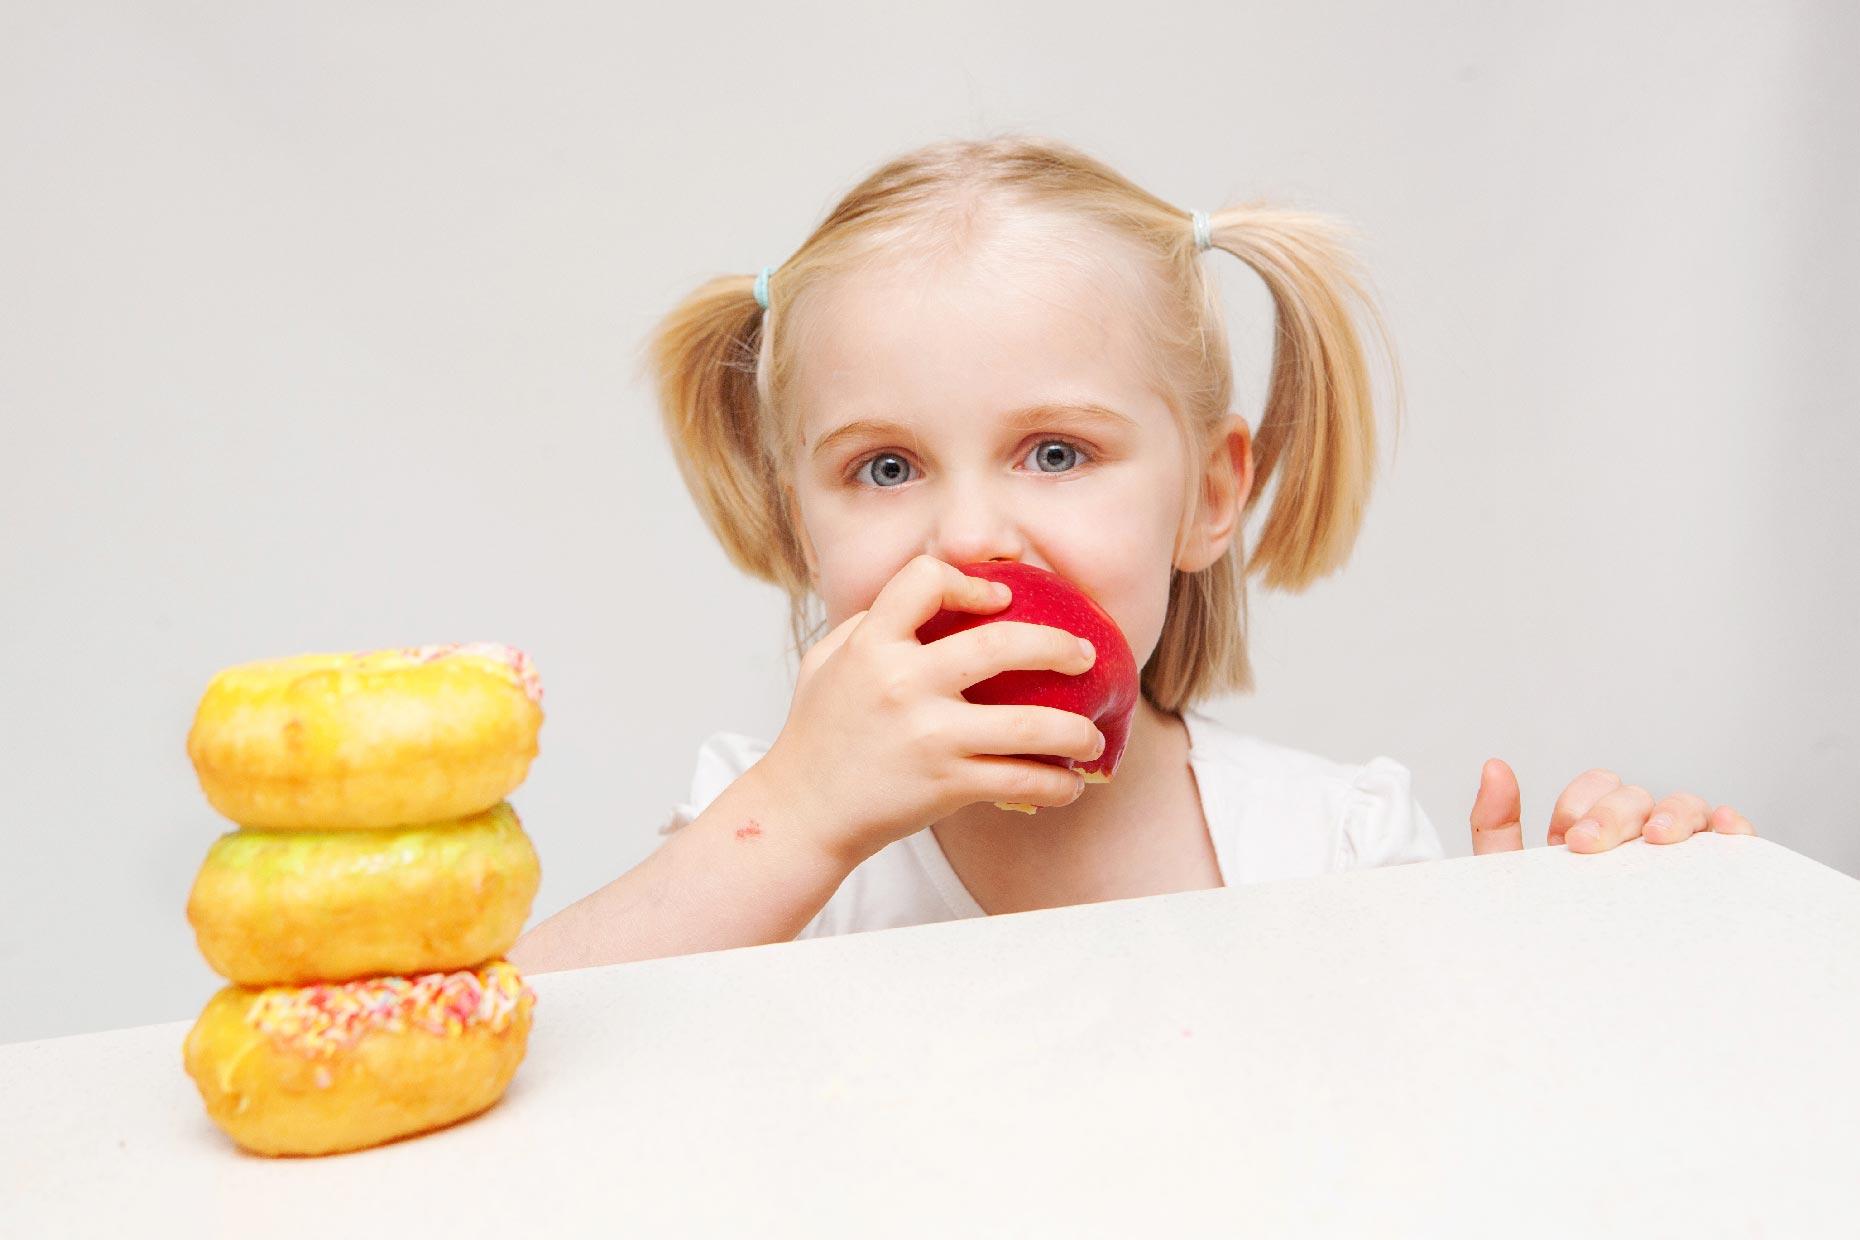 bambina mangia una mela e non le ciambelle